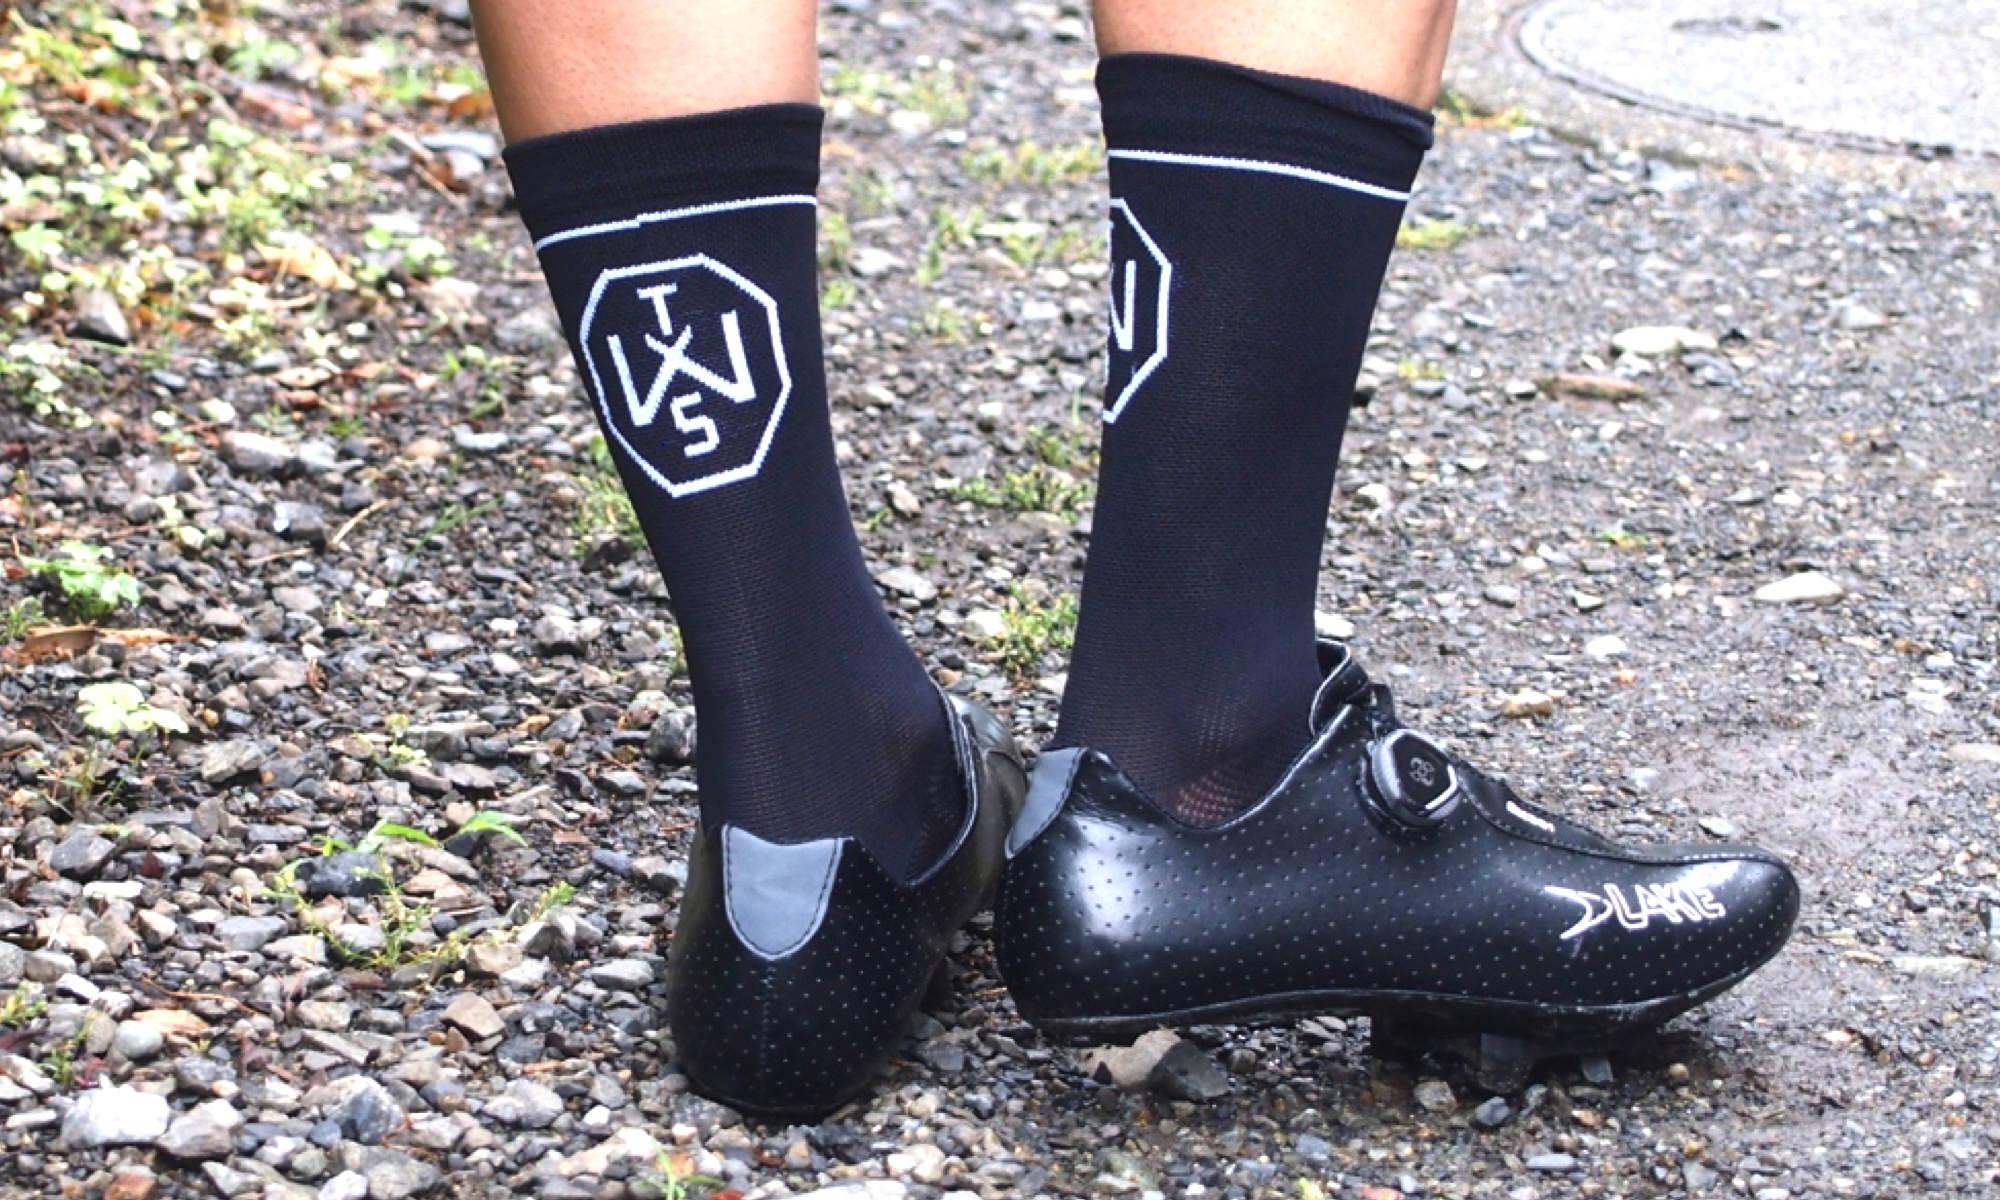 The Wonderful Socks #1 Rear